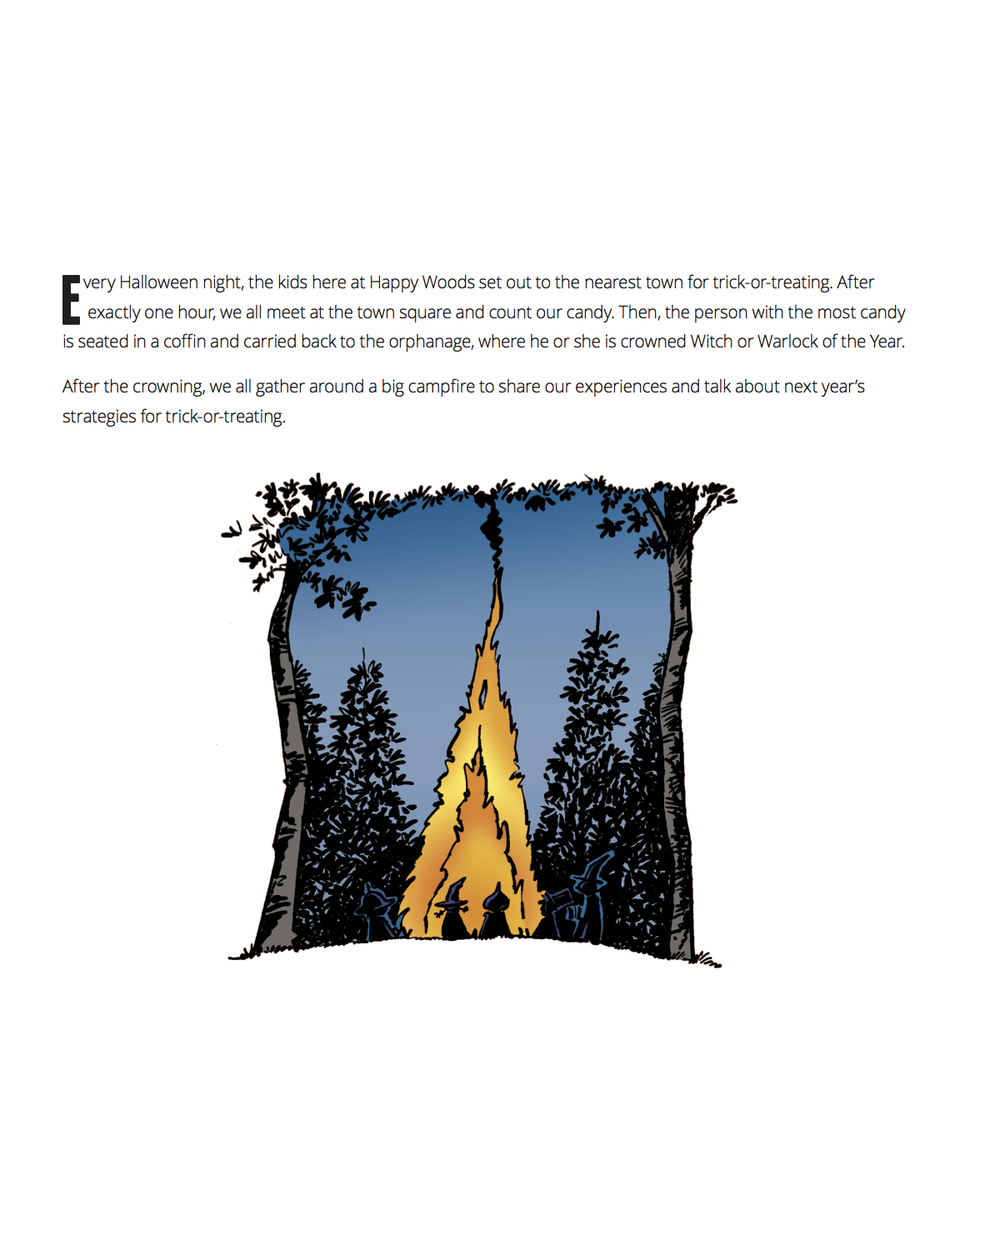 book2_paperback_inside_press (dragged) 1.jpg